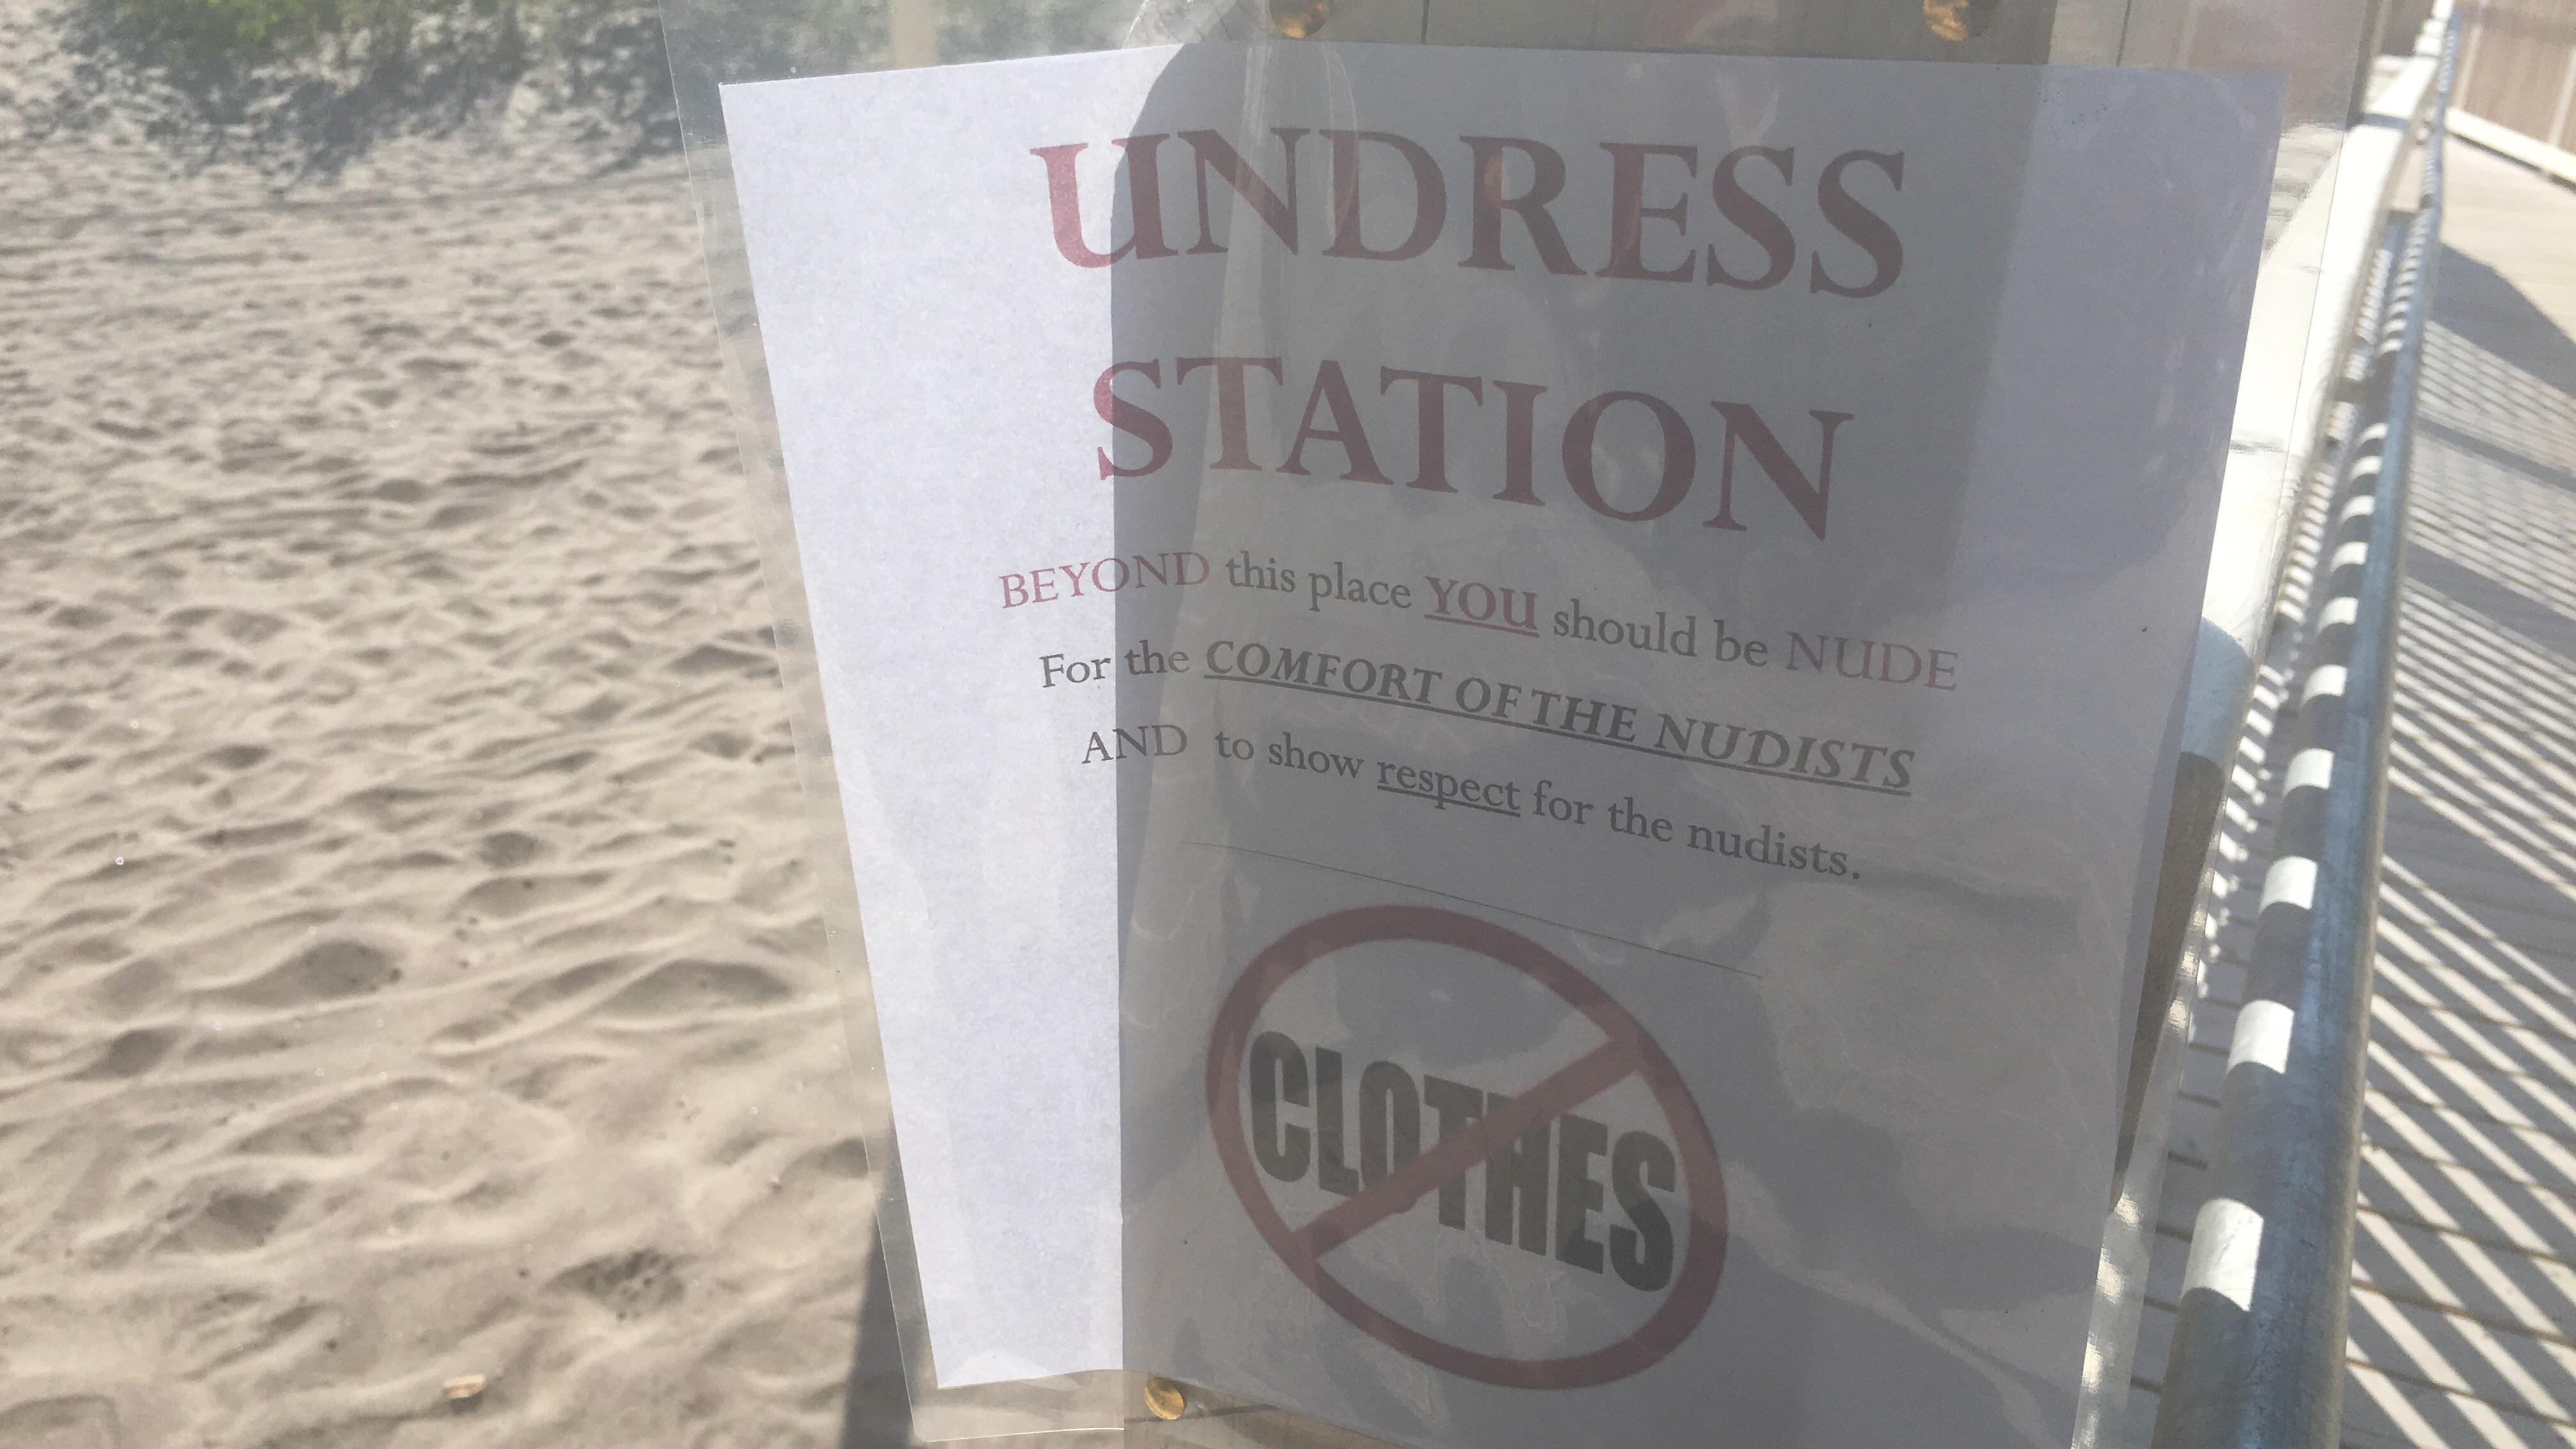 Clothes free nudist password